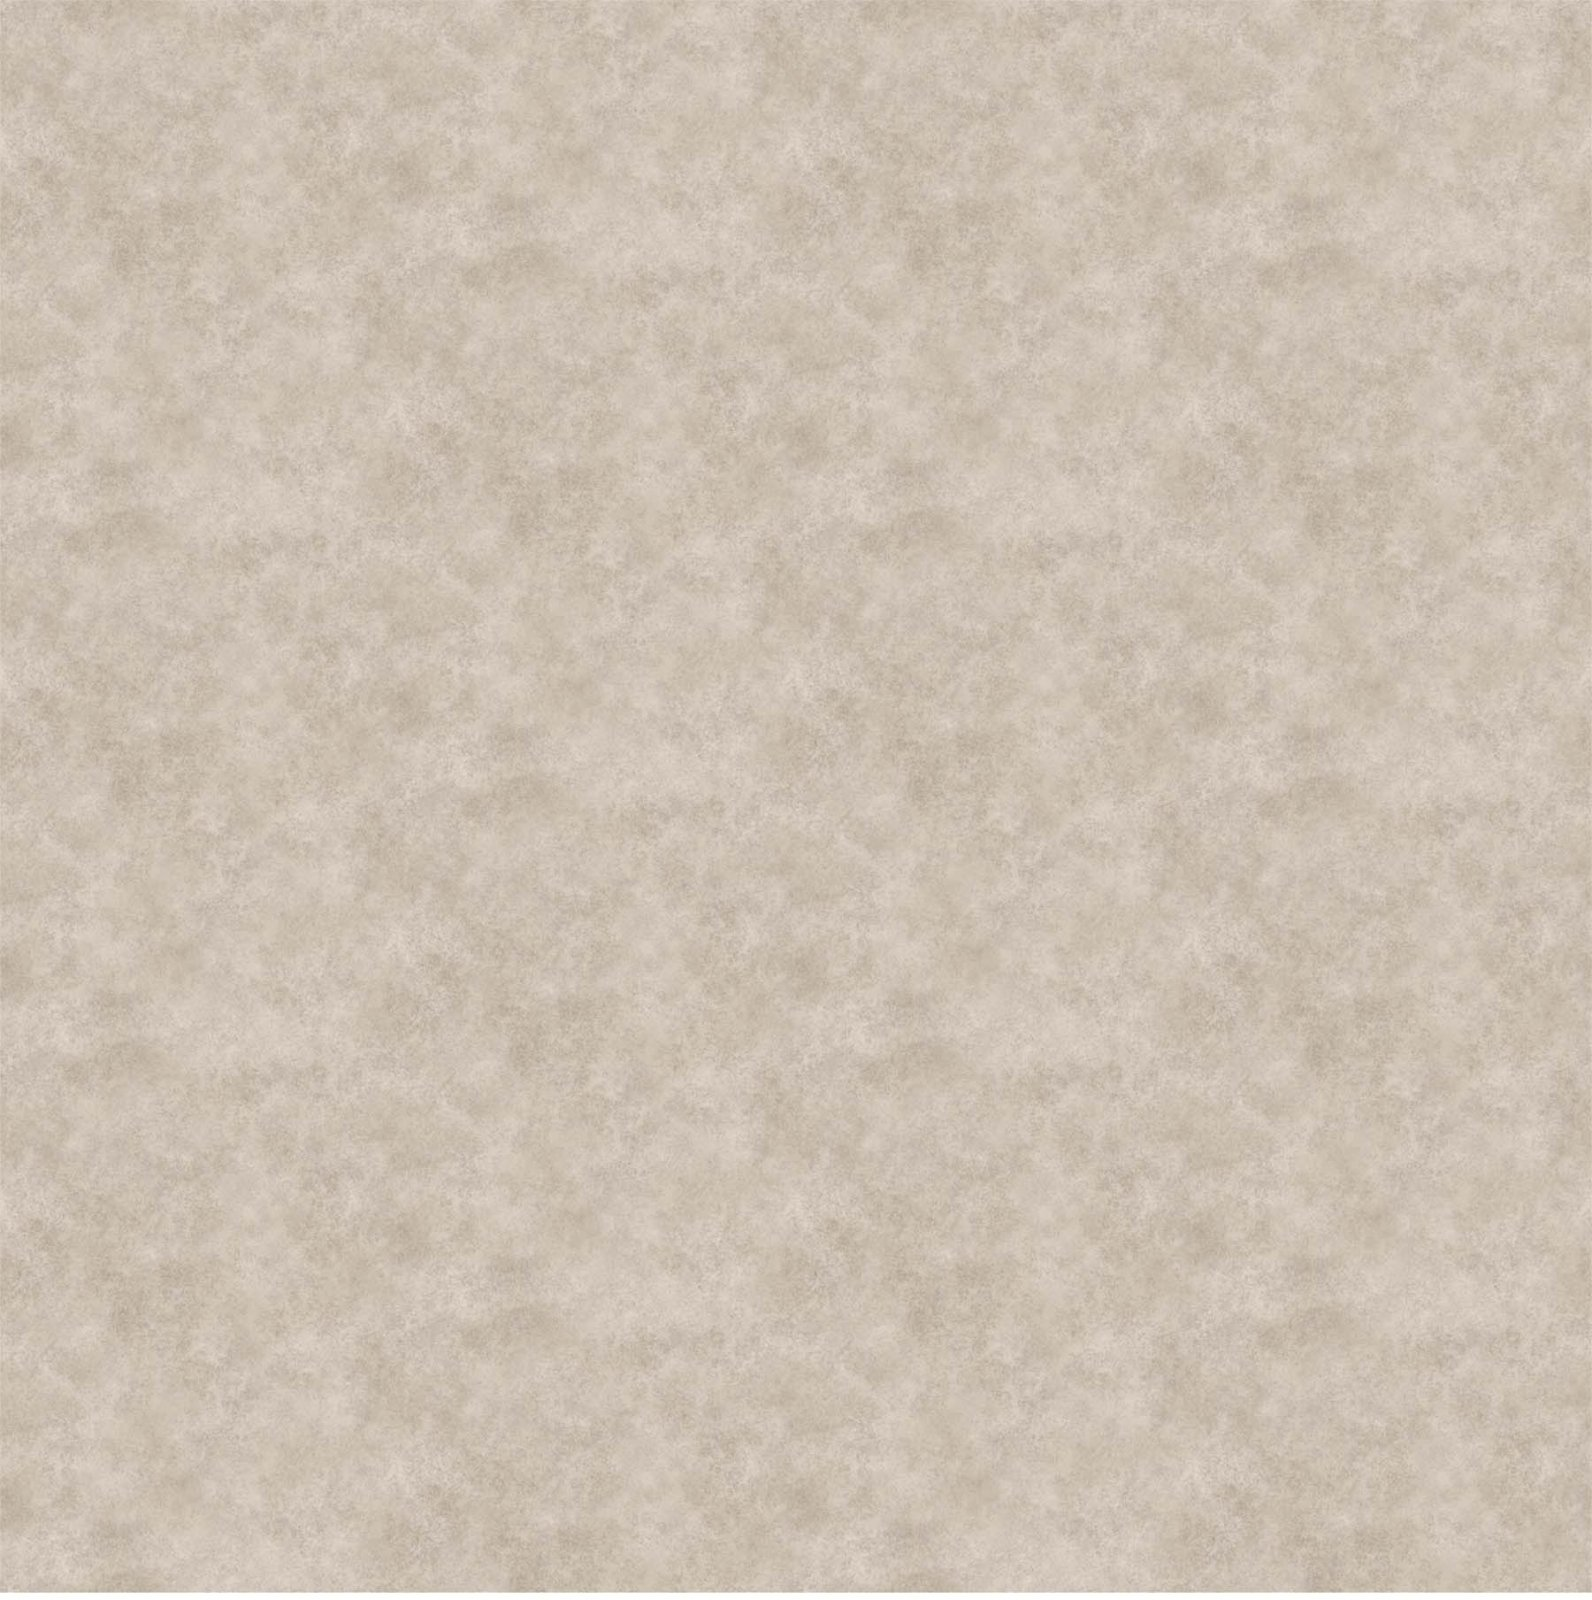 Shimmer - Radiance - Sandbox